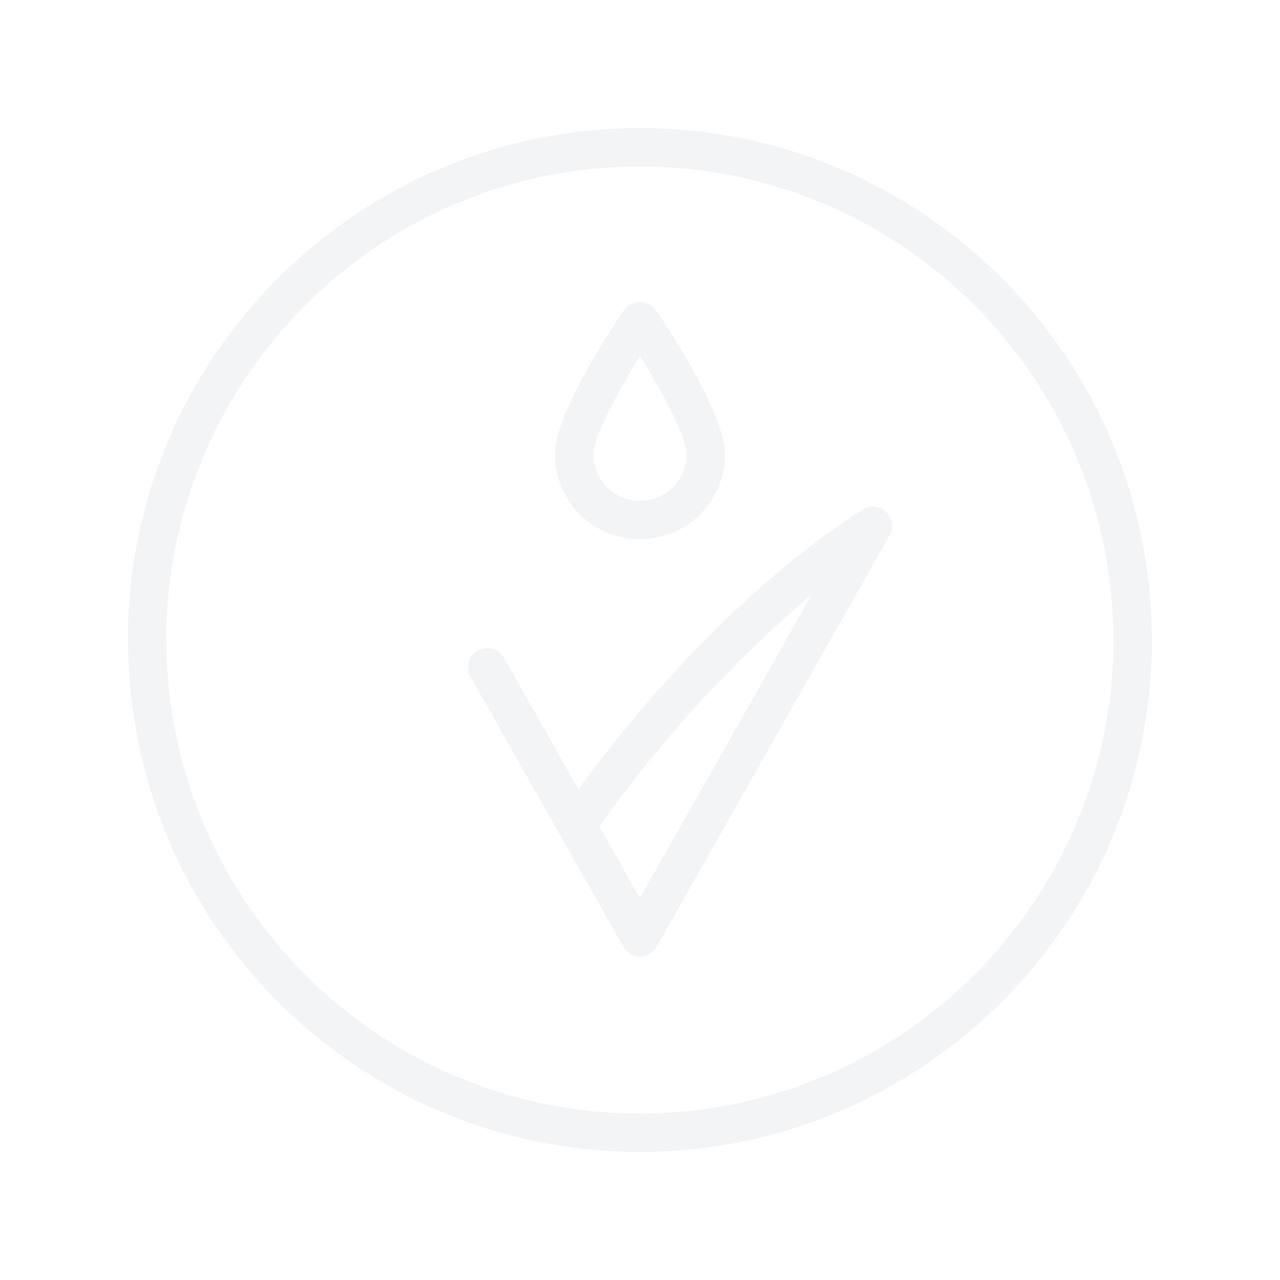 COLLISTAR Pure Actives Hyaluronic Acid Molecular Spray маска против морщин100ml